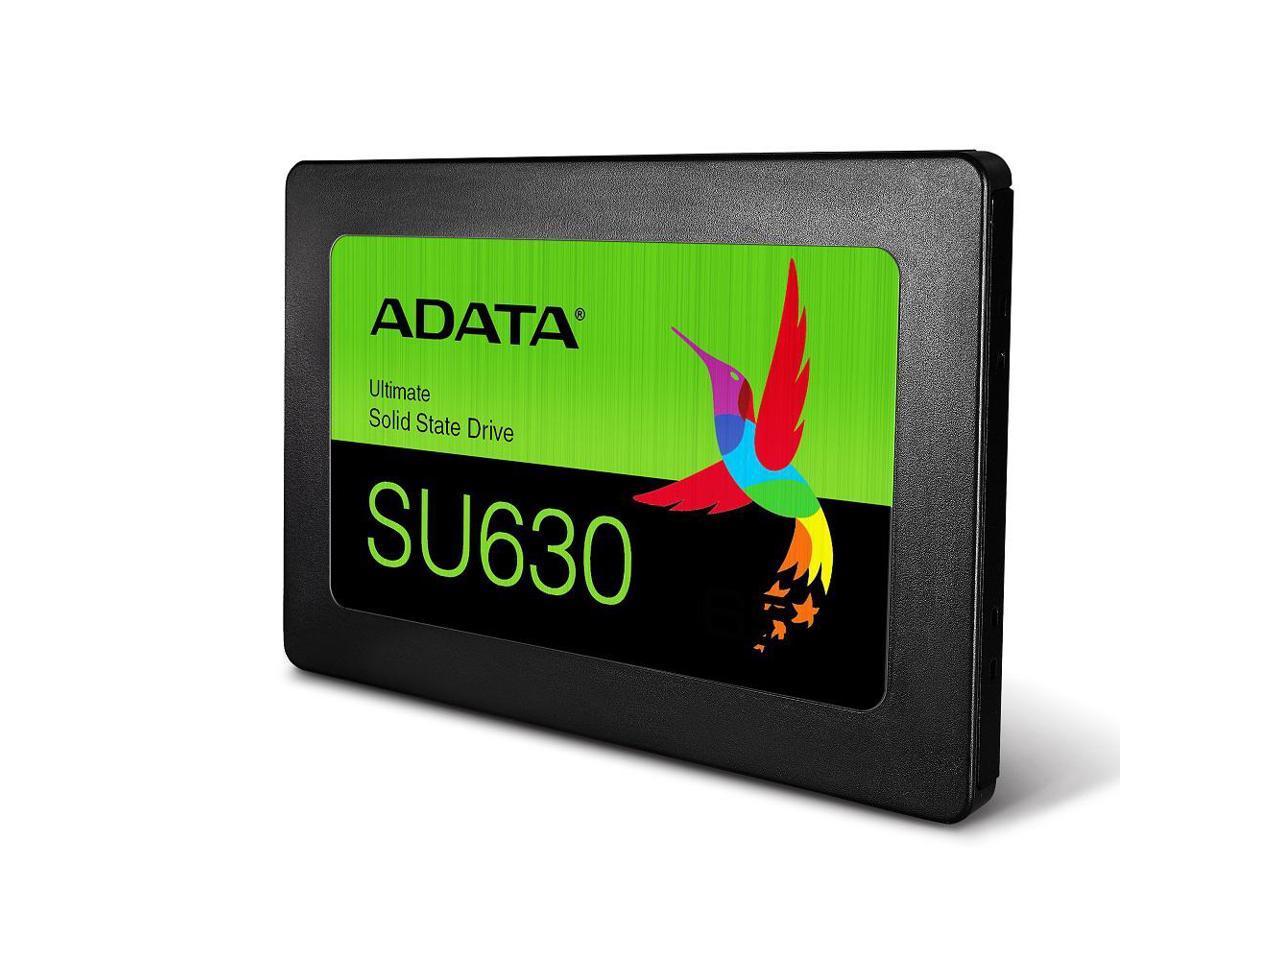 ADATA-Ultimate-Series-SU630-960GB-Internal-SATA-Solid-State-Drive thumbnail 3